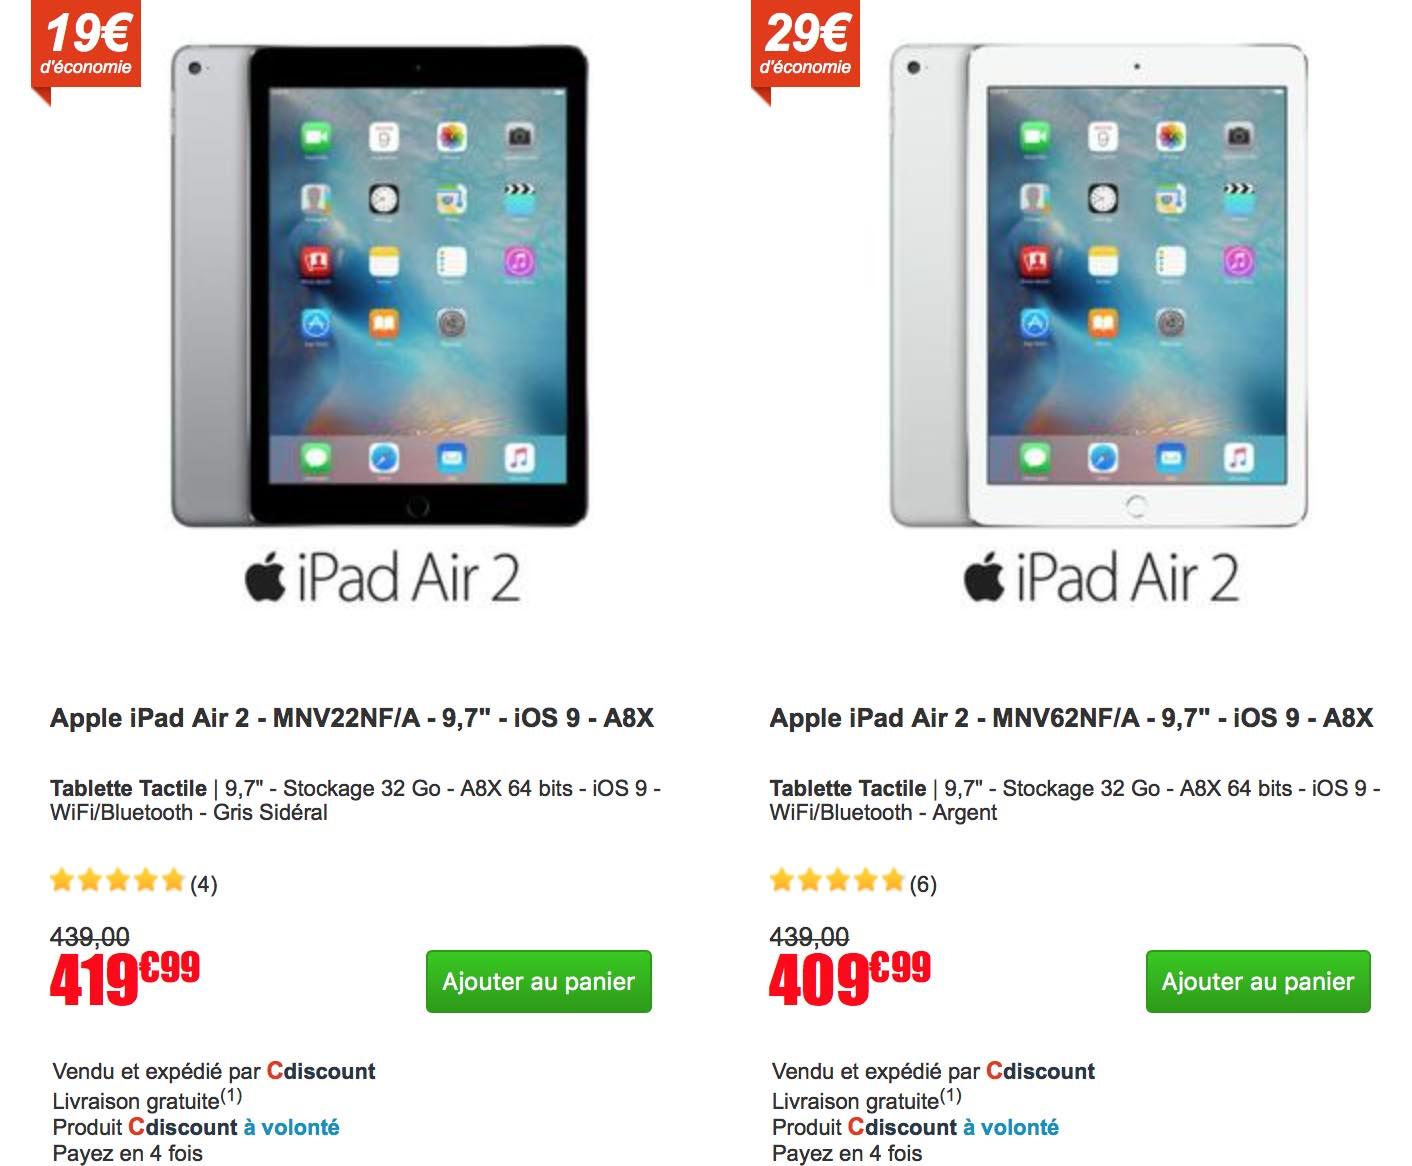 Promo iPad Air 2 CDiscount